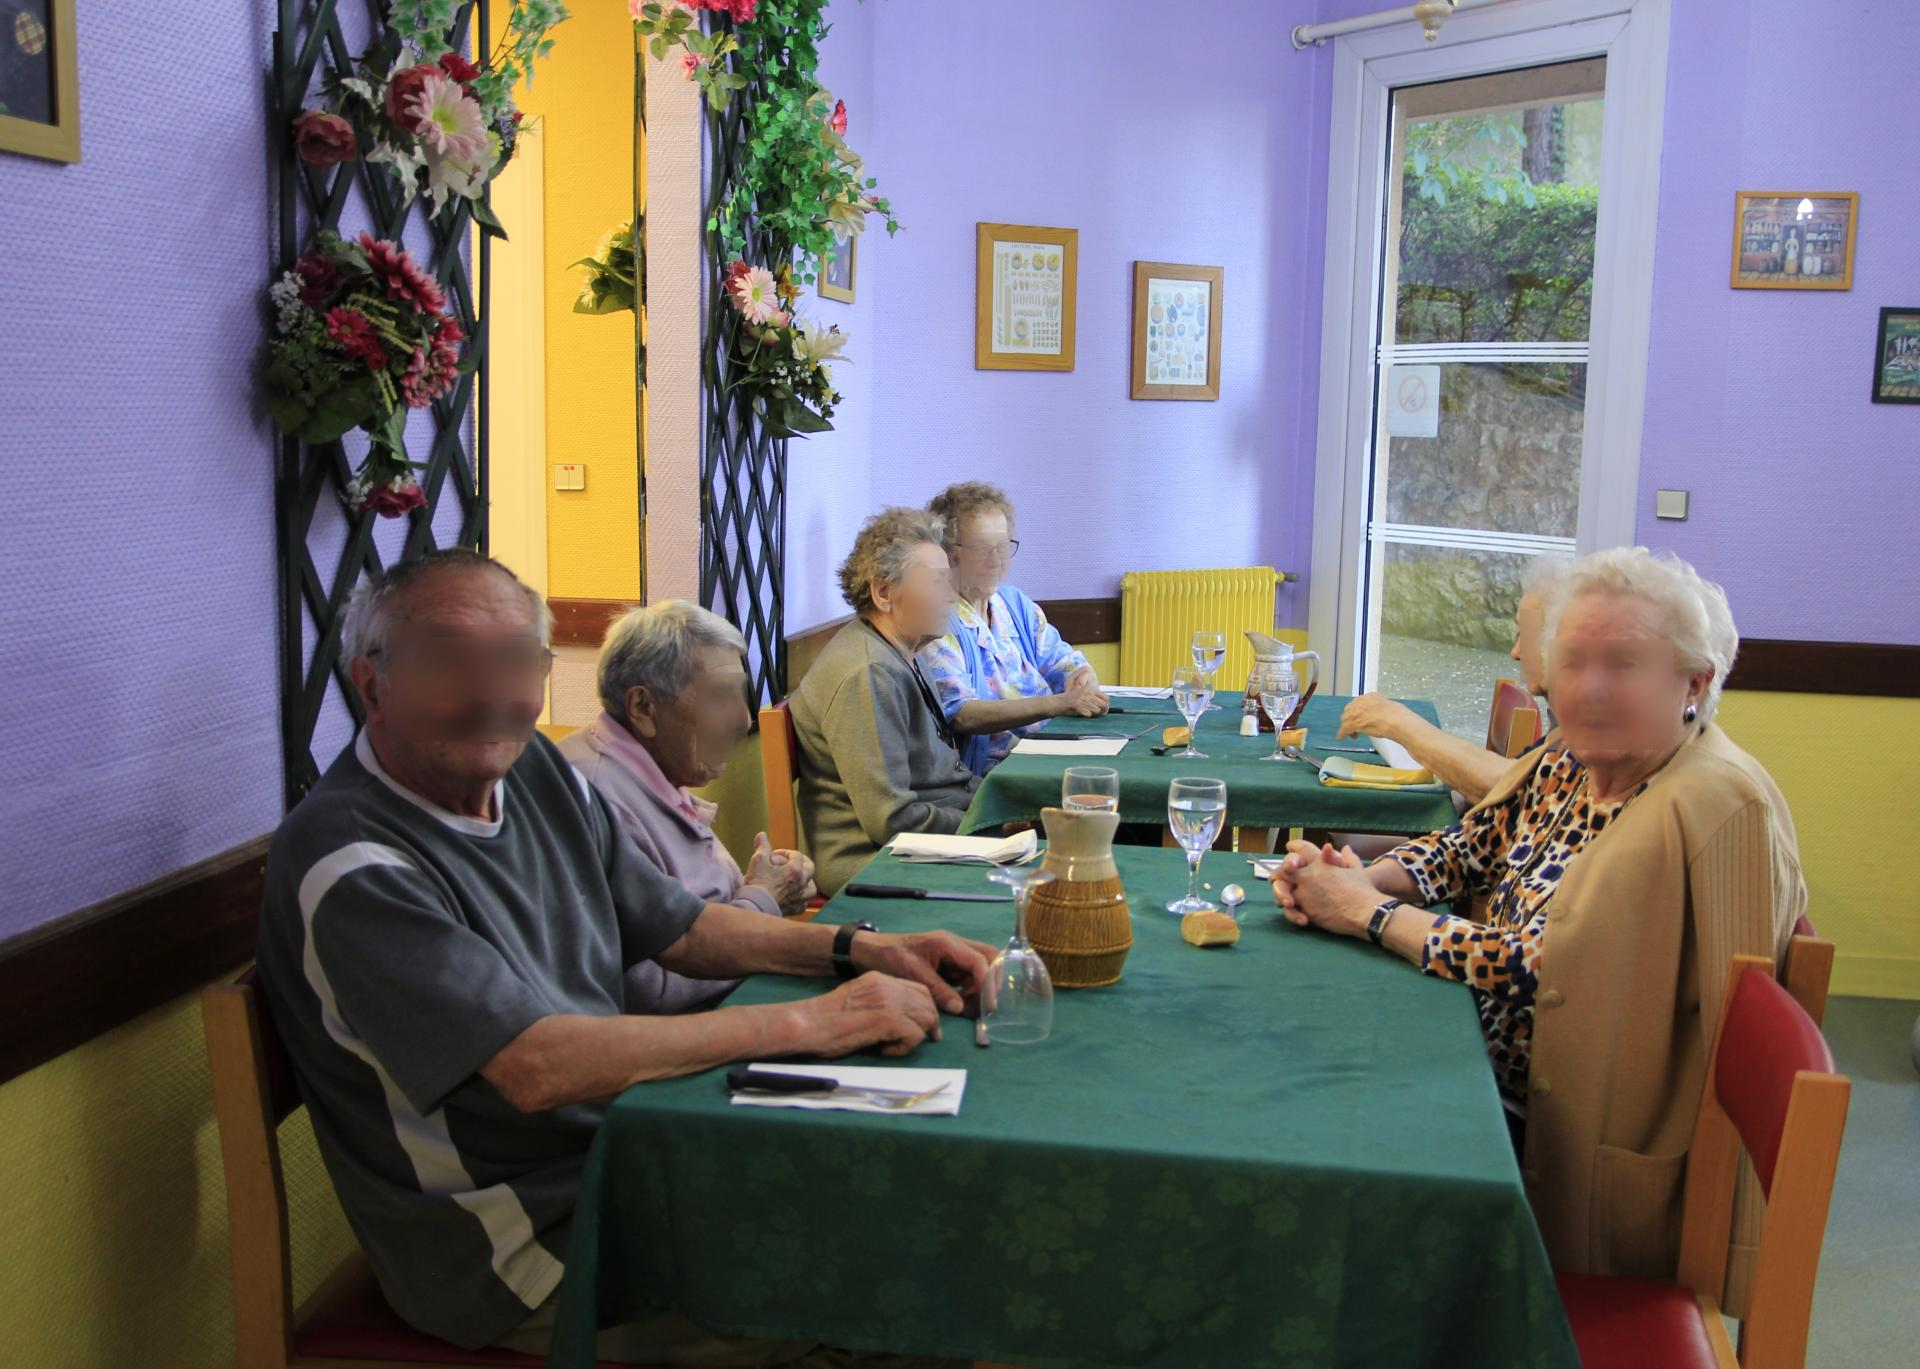 Restaurant 4 Résidence sénior Maison de Retraite Ma Vallée Us Val d'Oise 95